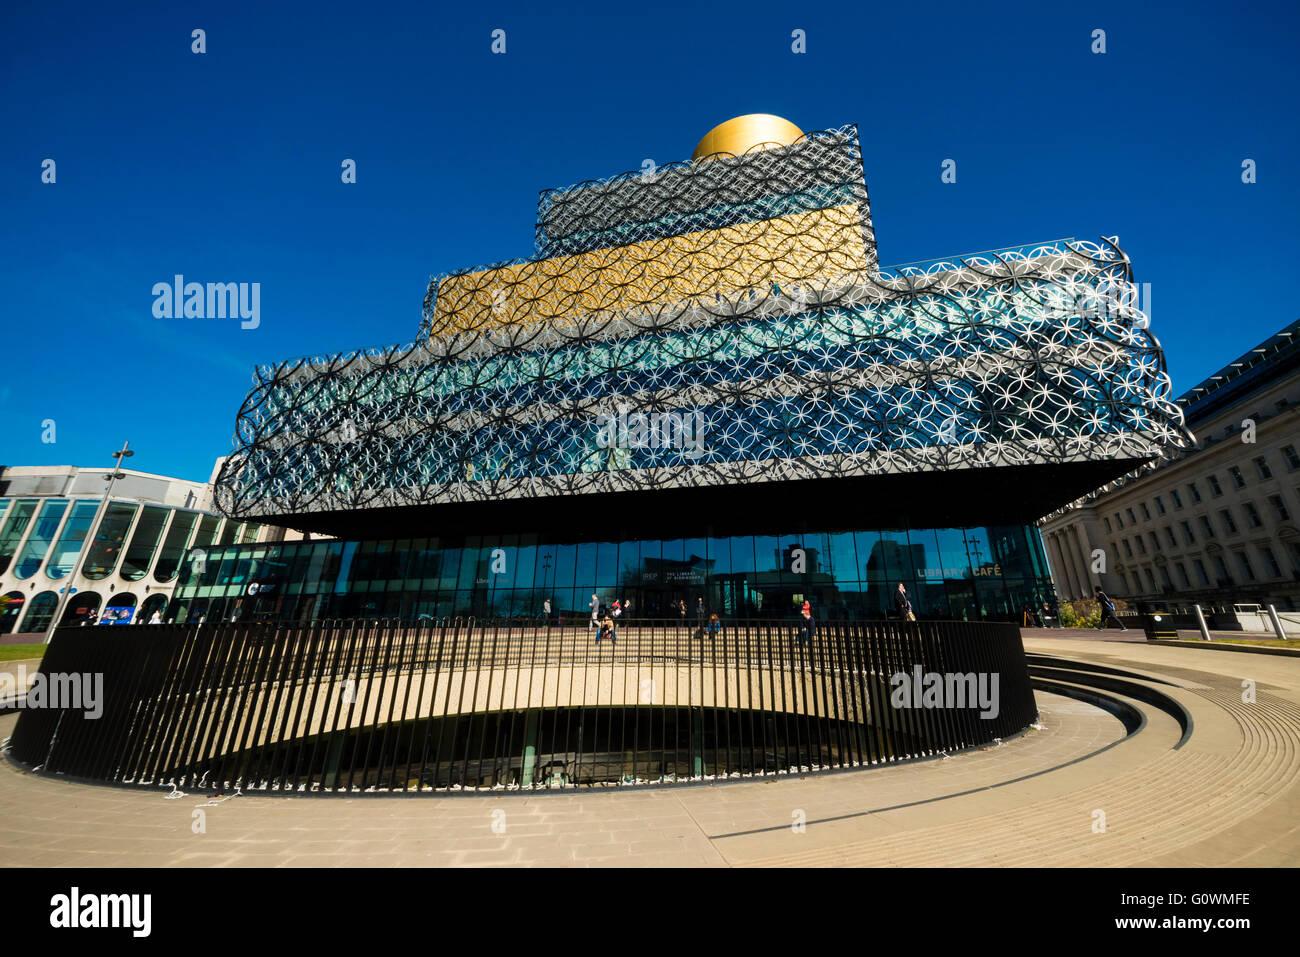 Biblioteca de Birmingham, Reino Unido. Imagen De Stock